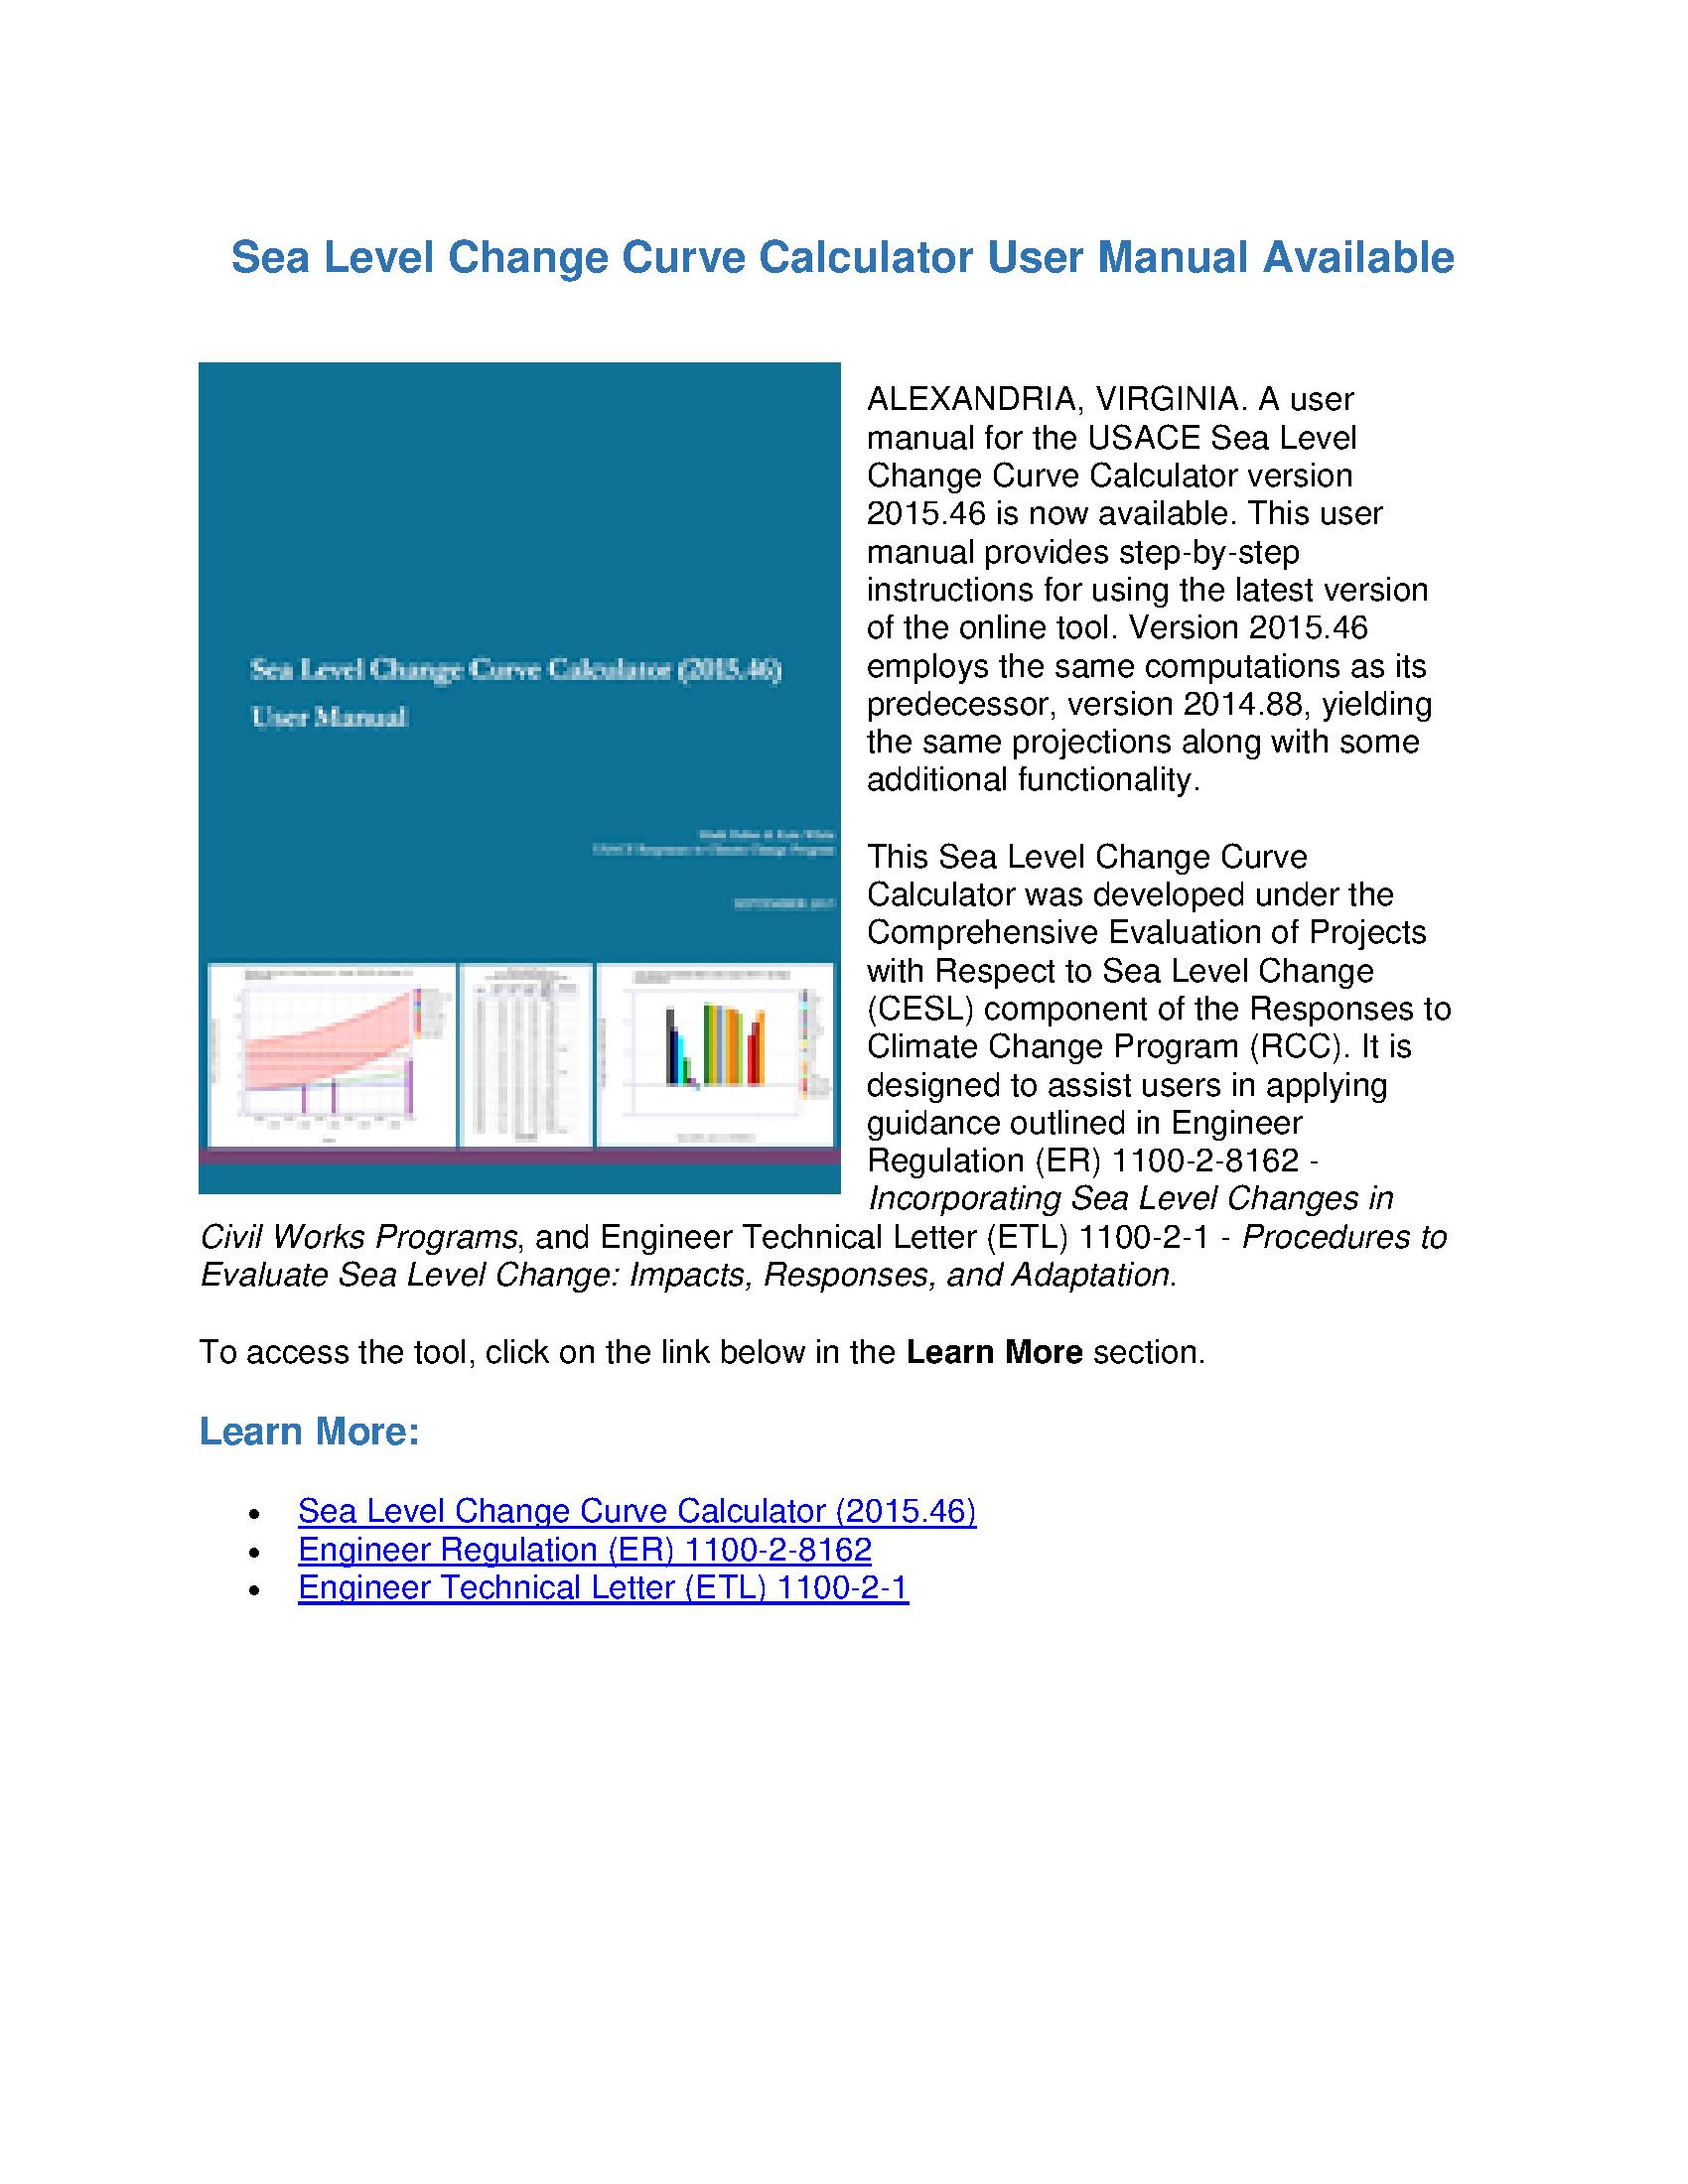 Sea Level Change Curve Calculator User Manual Available Technical